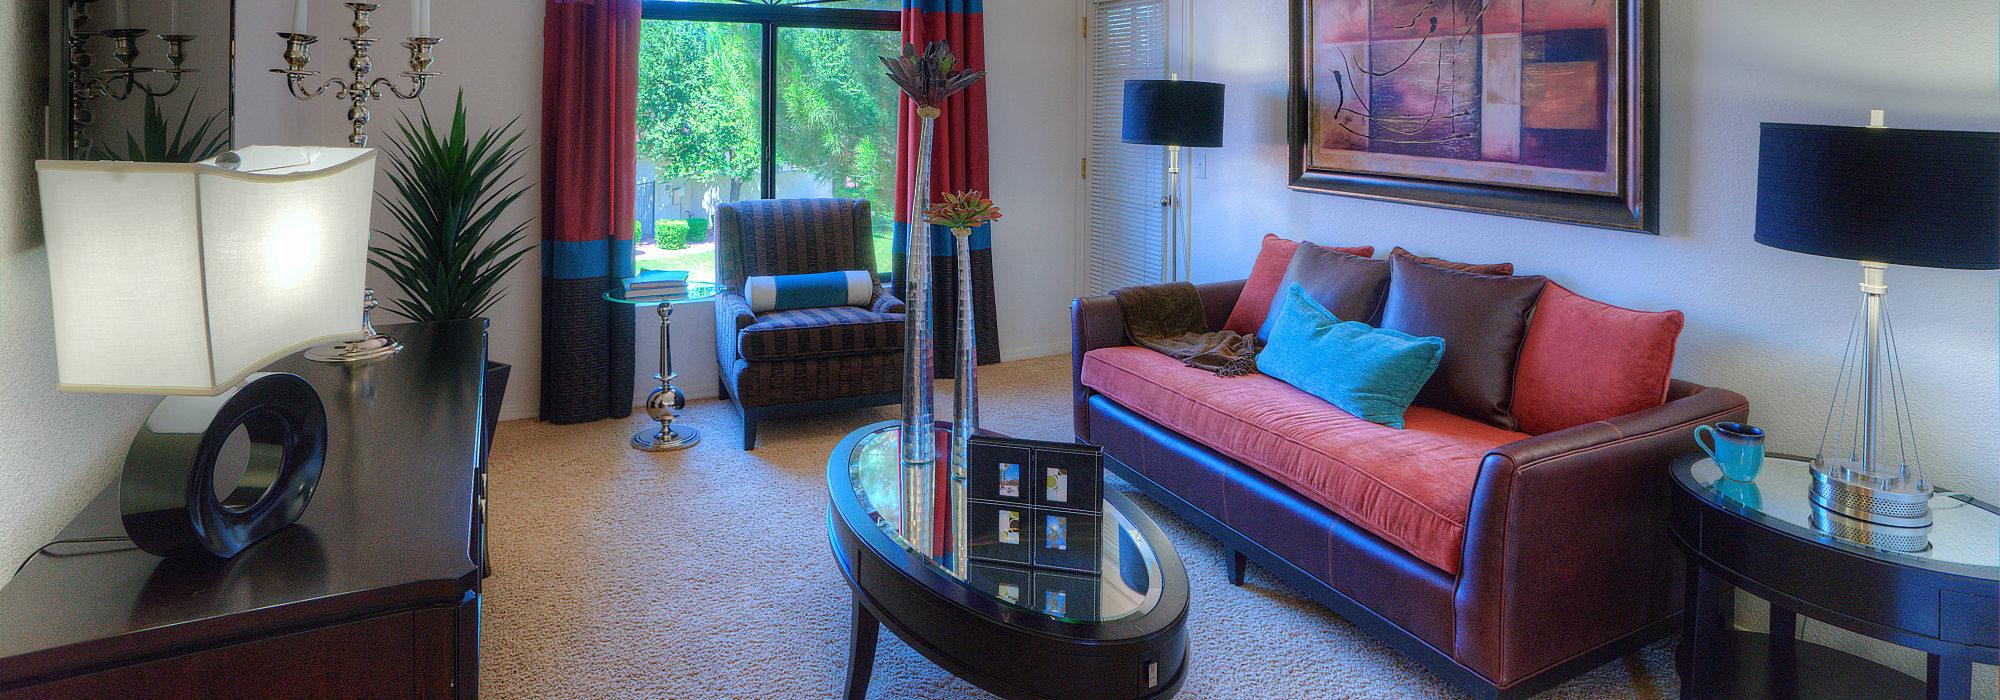 Luxury living room at San Cervantes in Chandler, Arizona